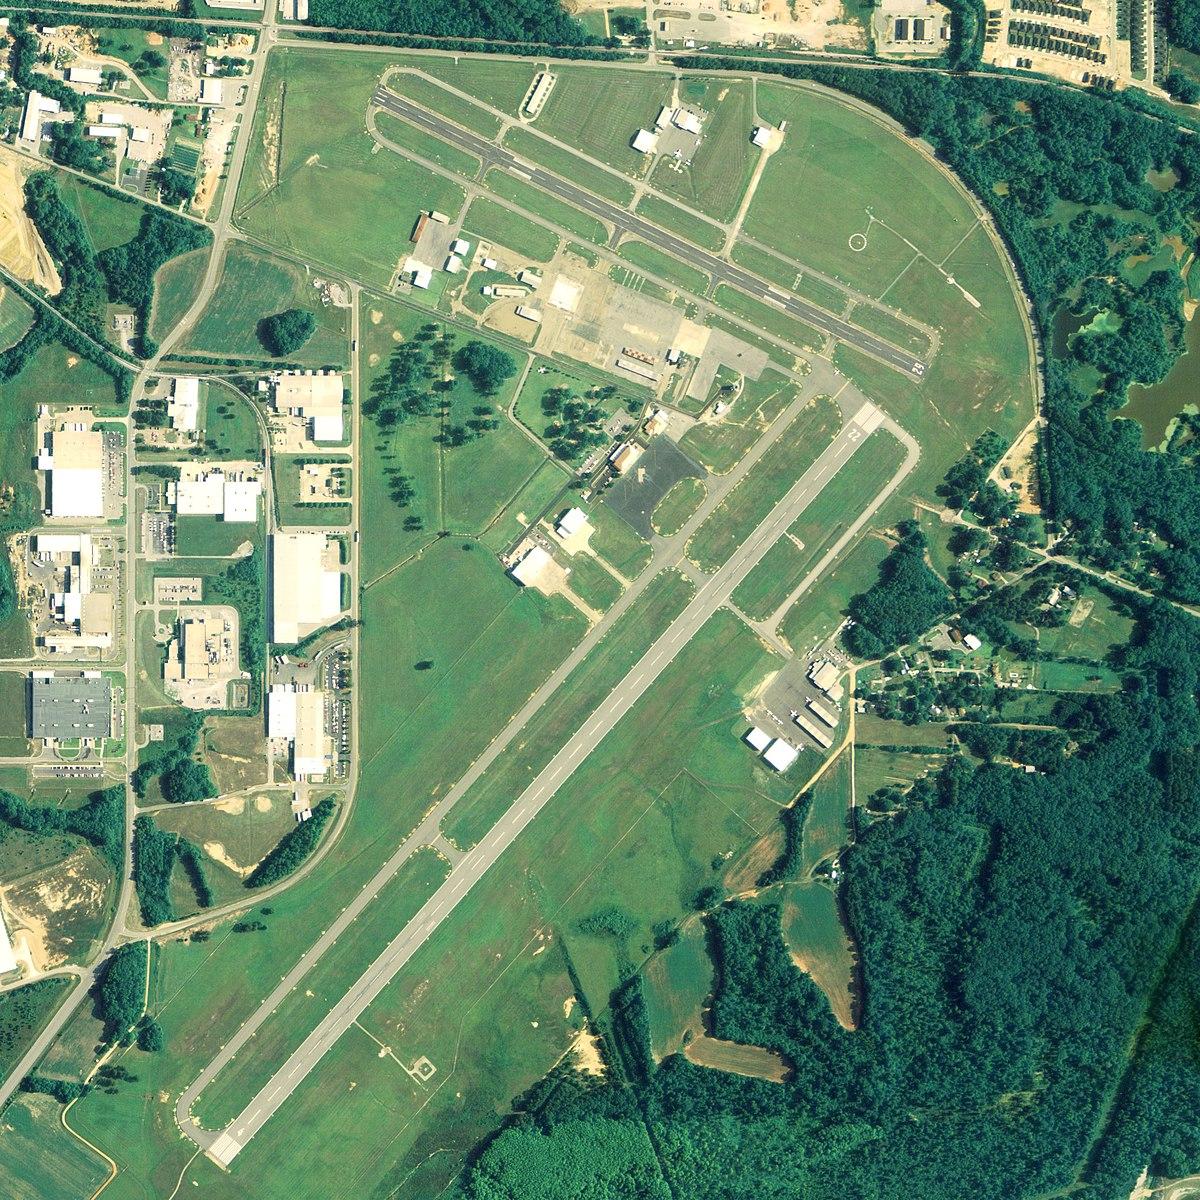 Tuscaloosa Regional Airport Wikipedia - Alabama airports